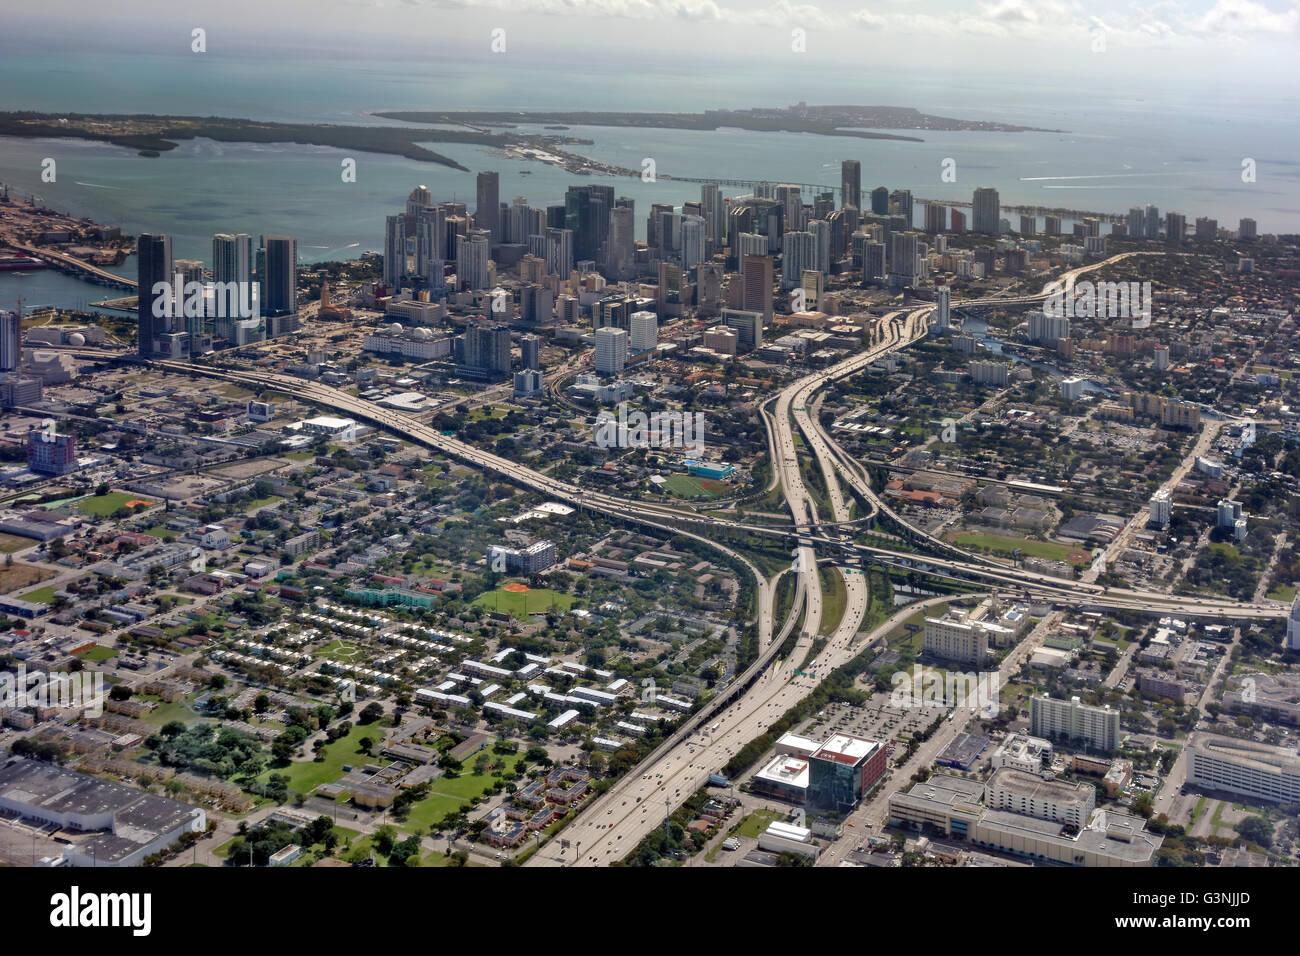 Aerial view of Downtown Miami, Florida, USA - Stock Image